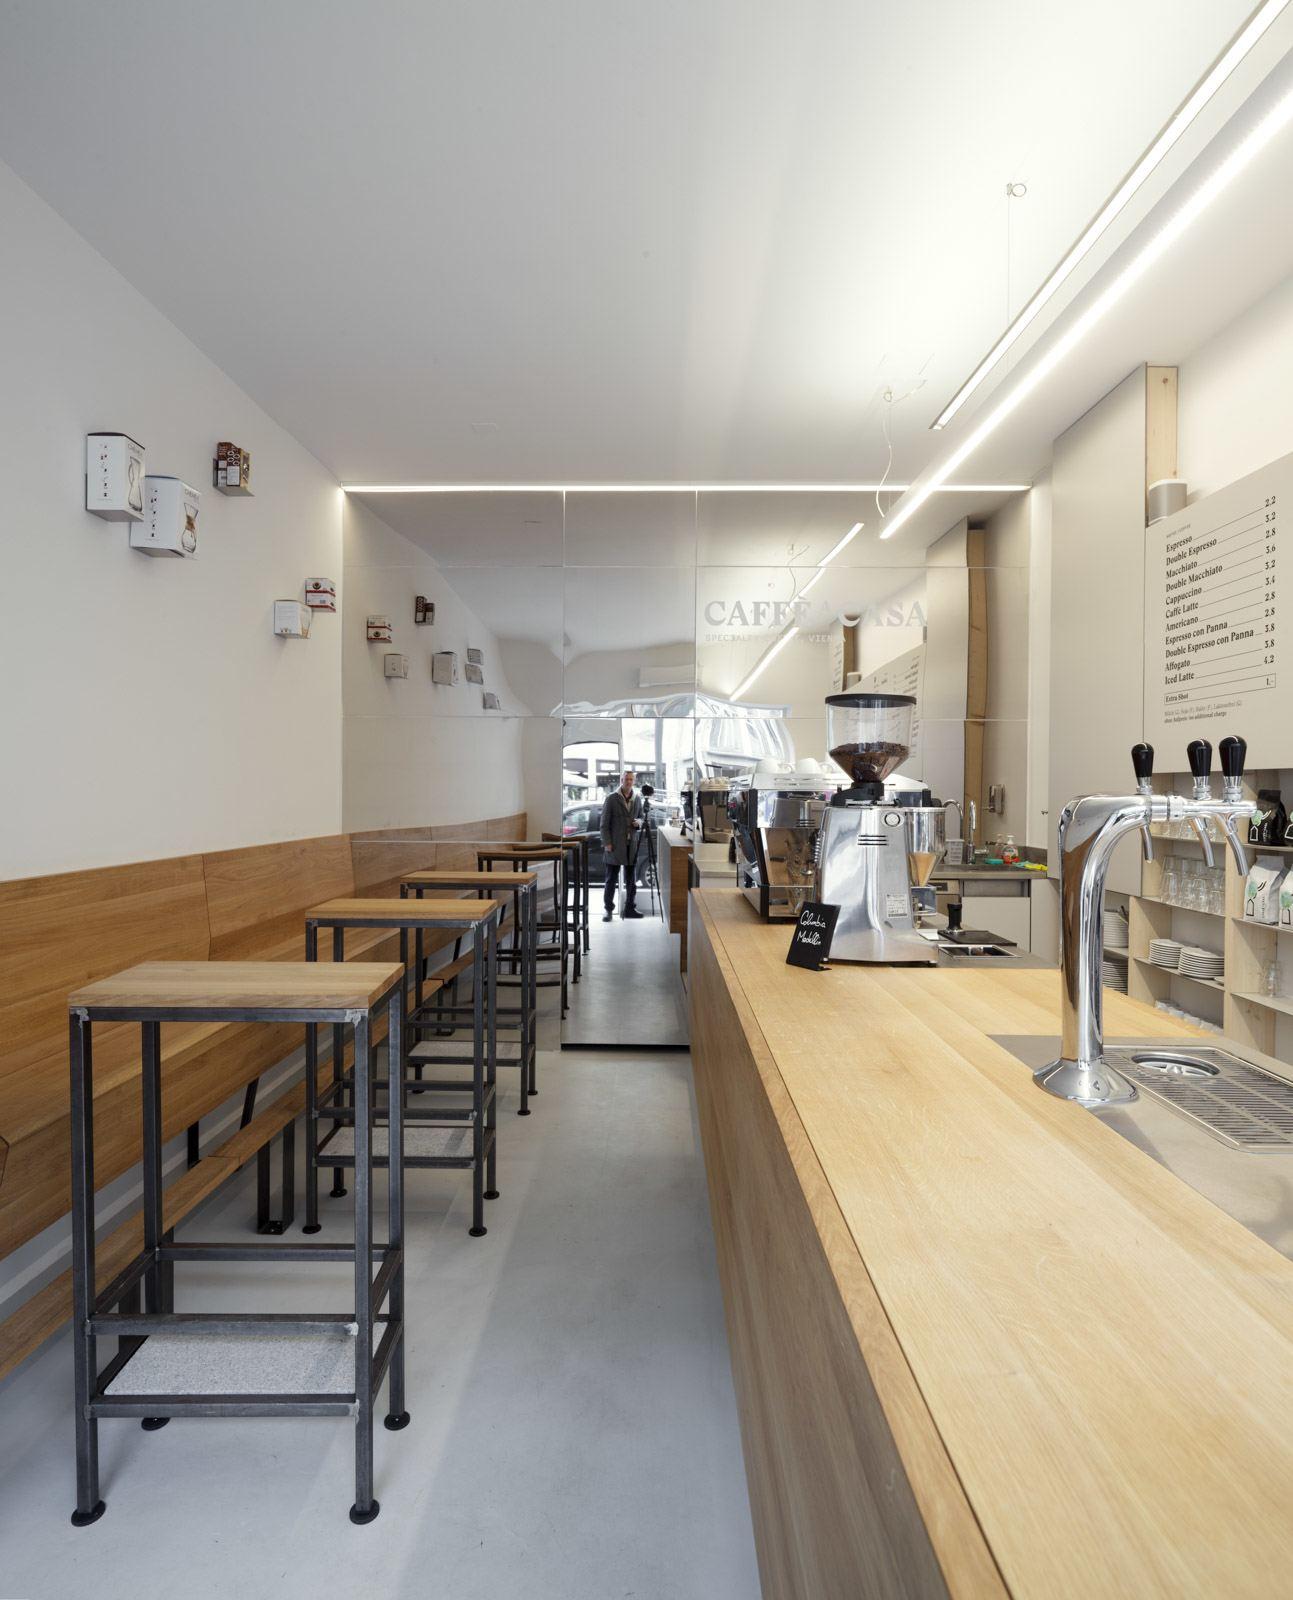 Caffe a Casa Rumpfhuber